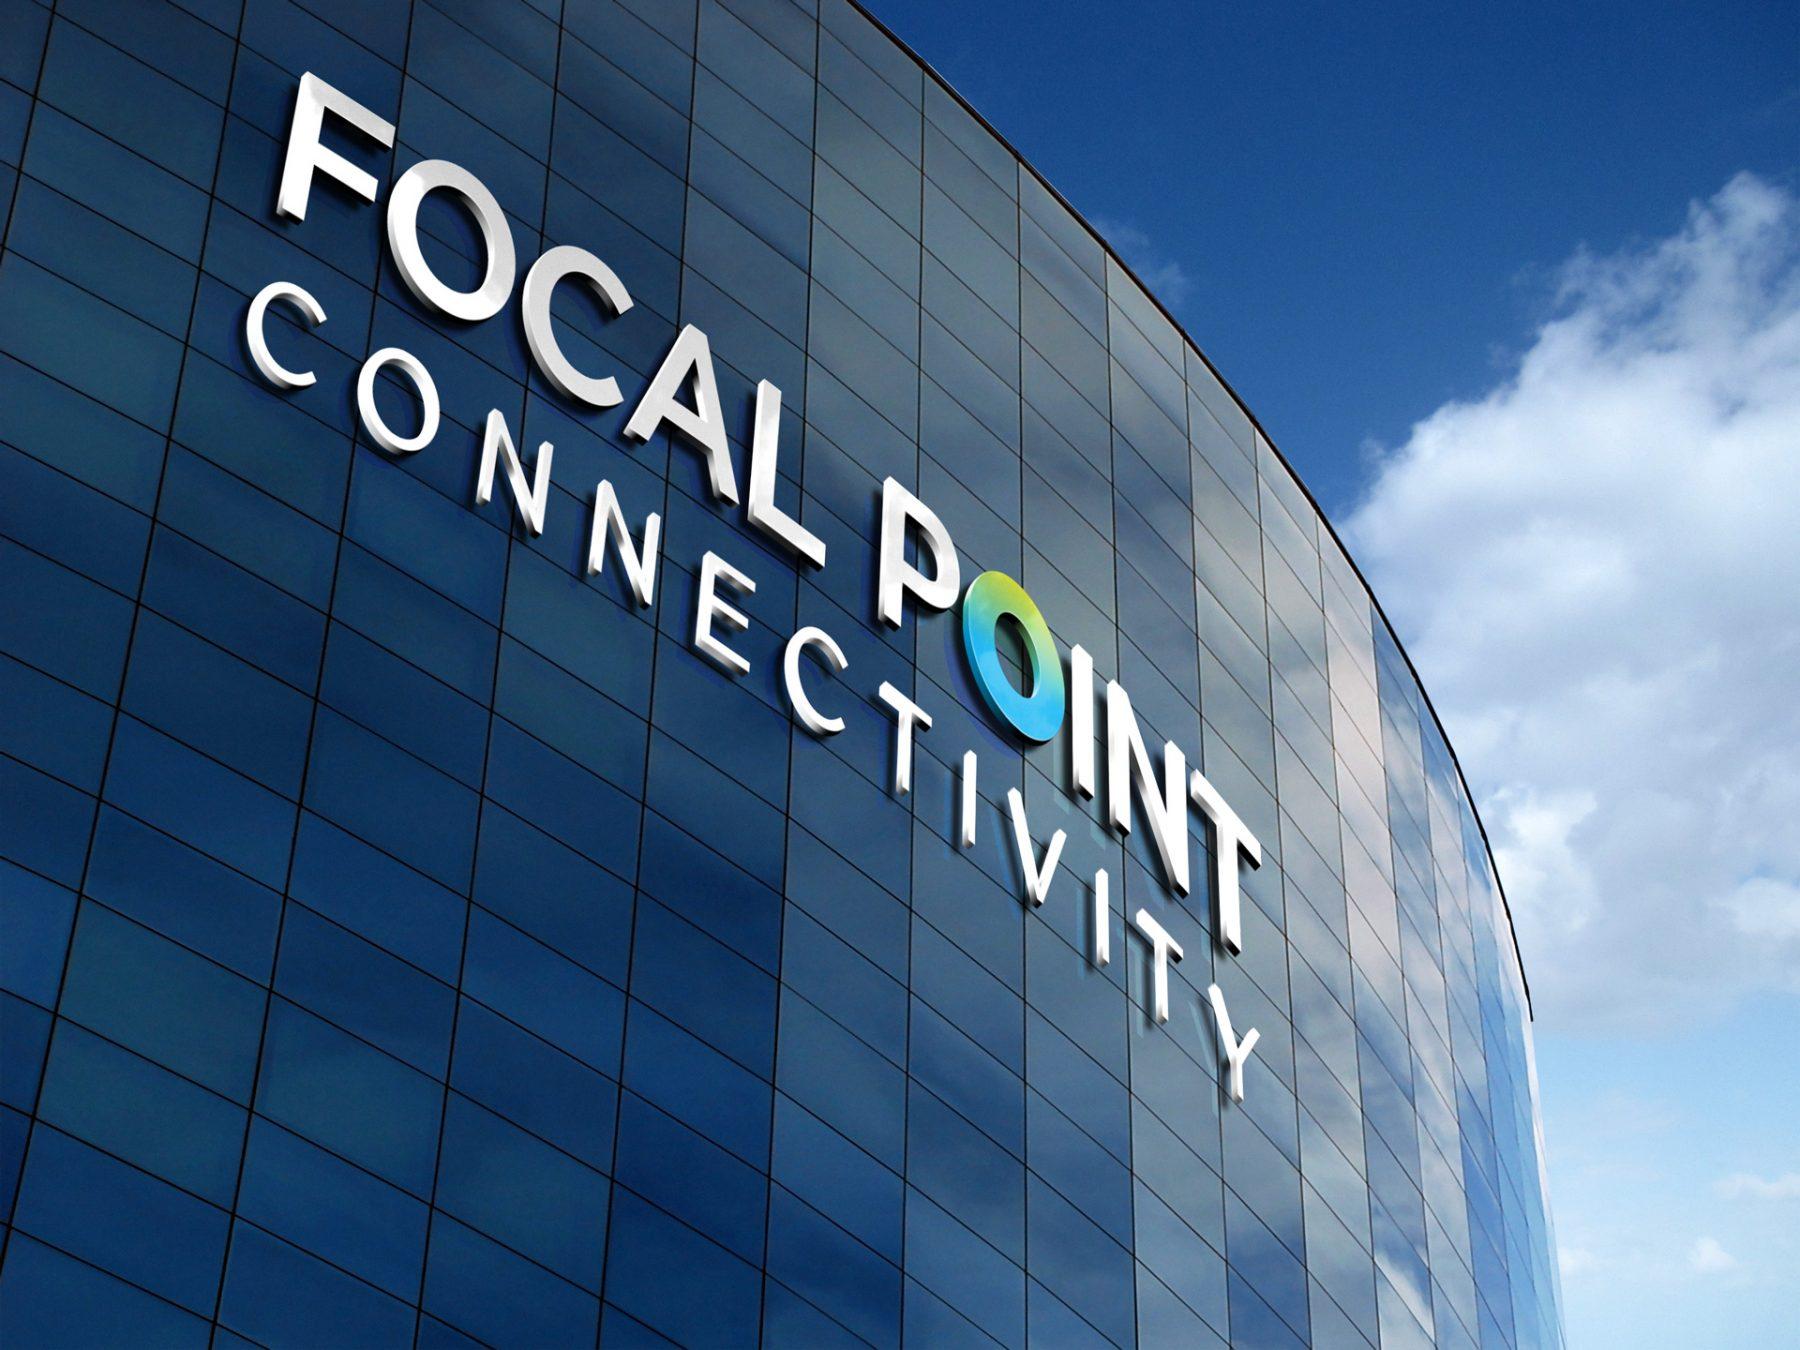 Focal Point Connectivity - logo design - signage